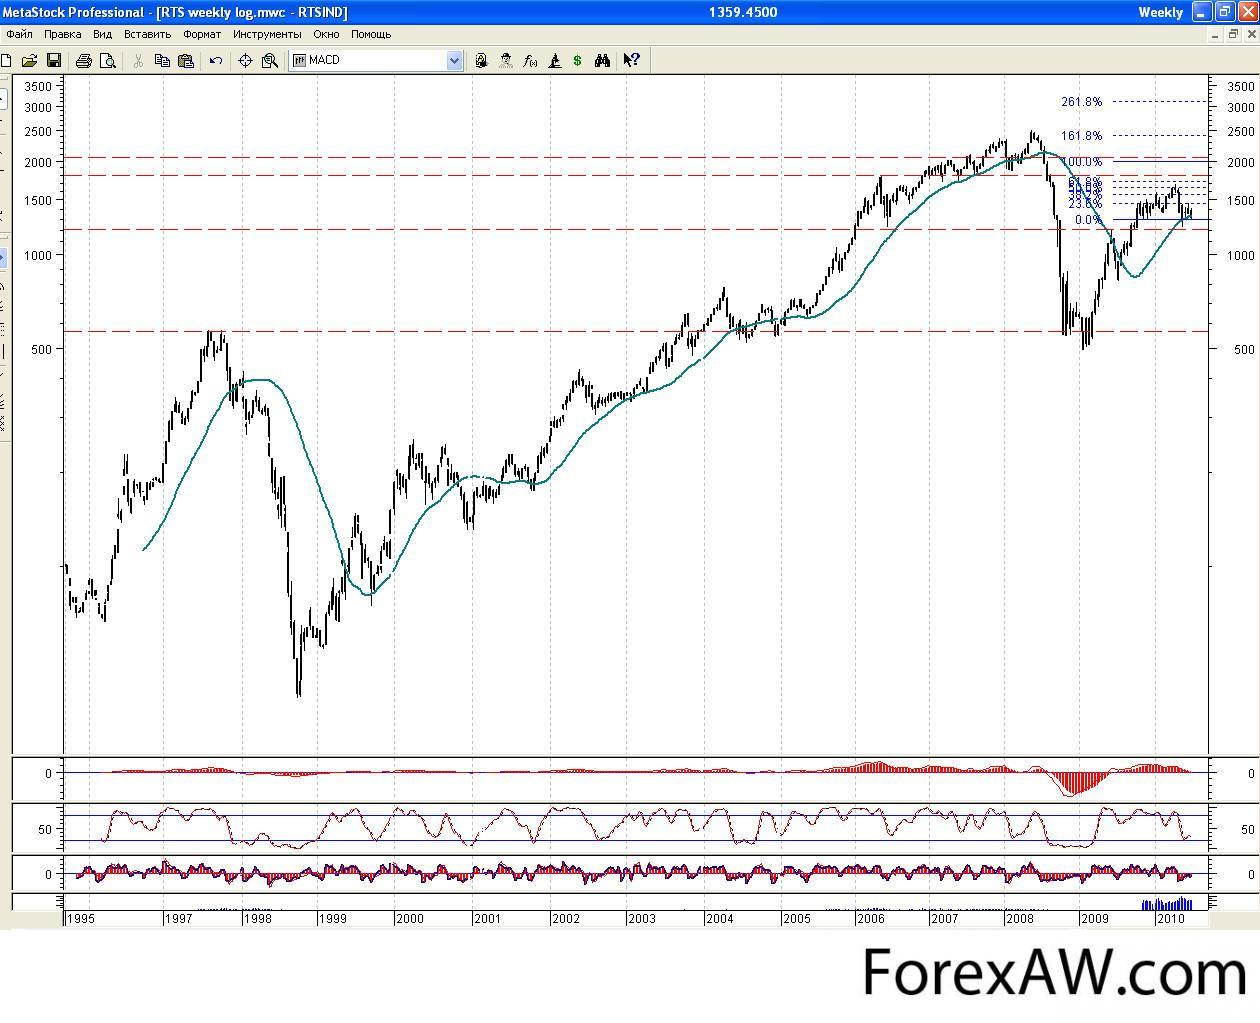 Investicijų portfelio diversifikavimas | splc.lt